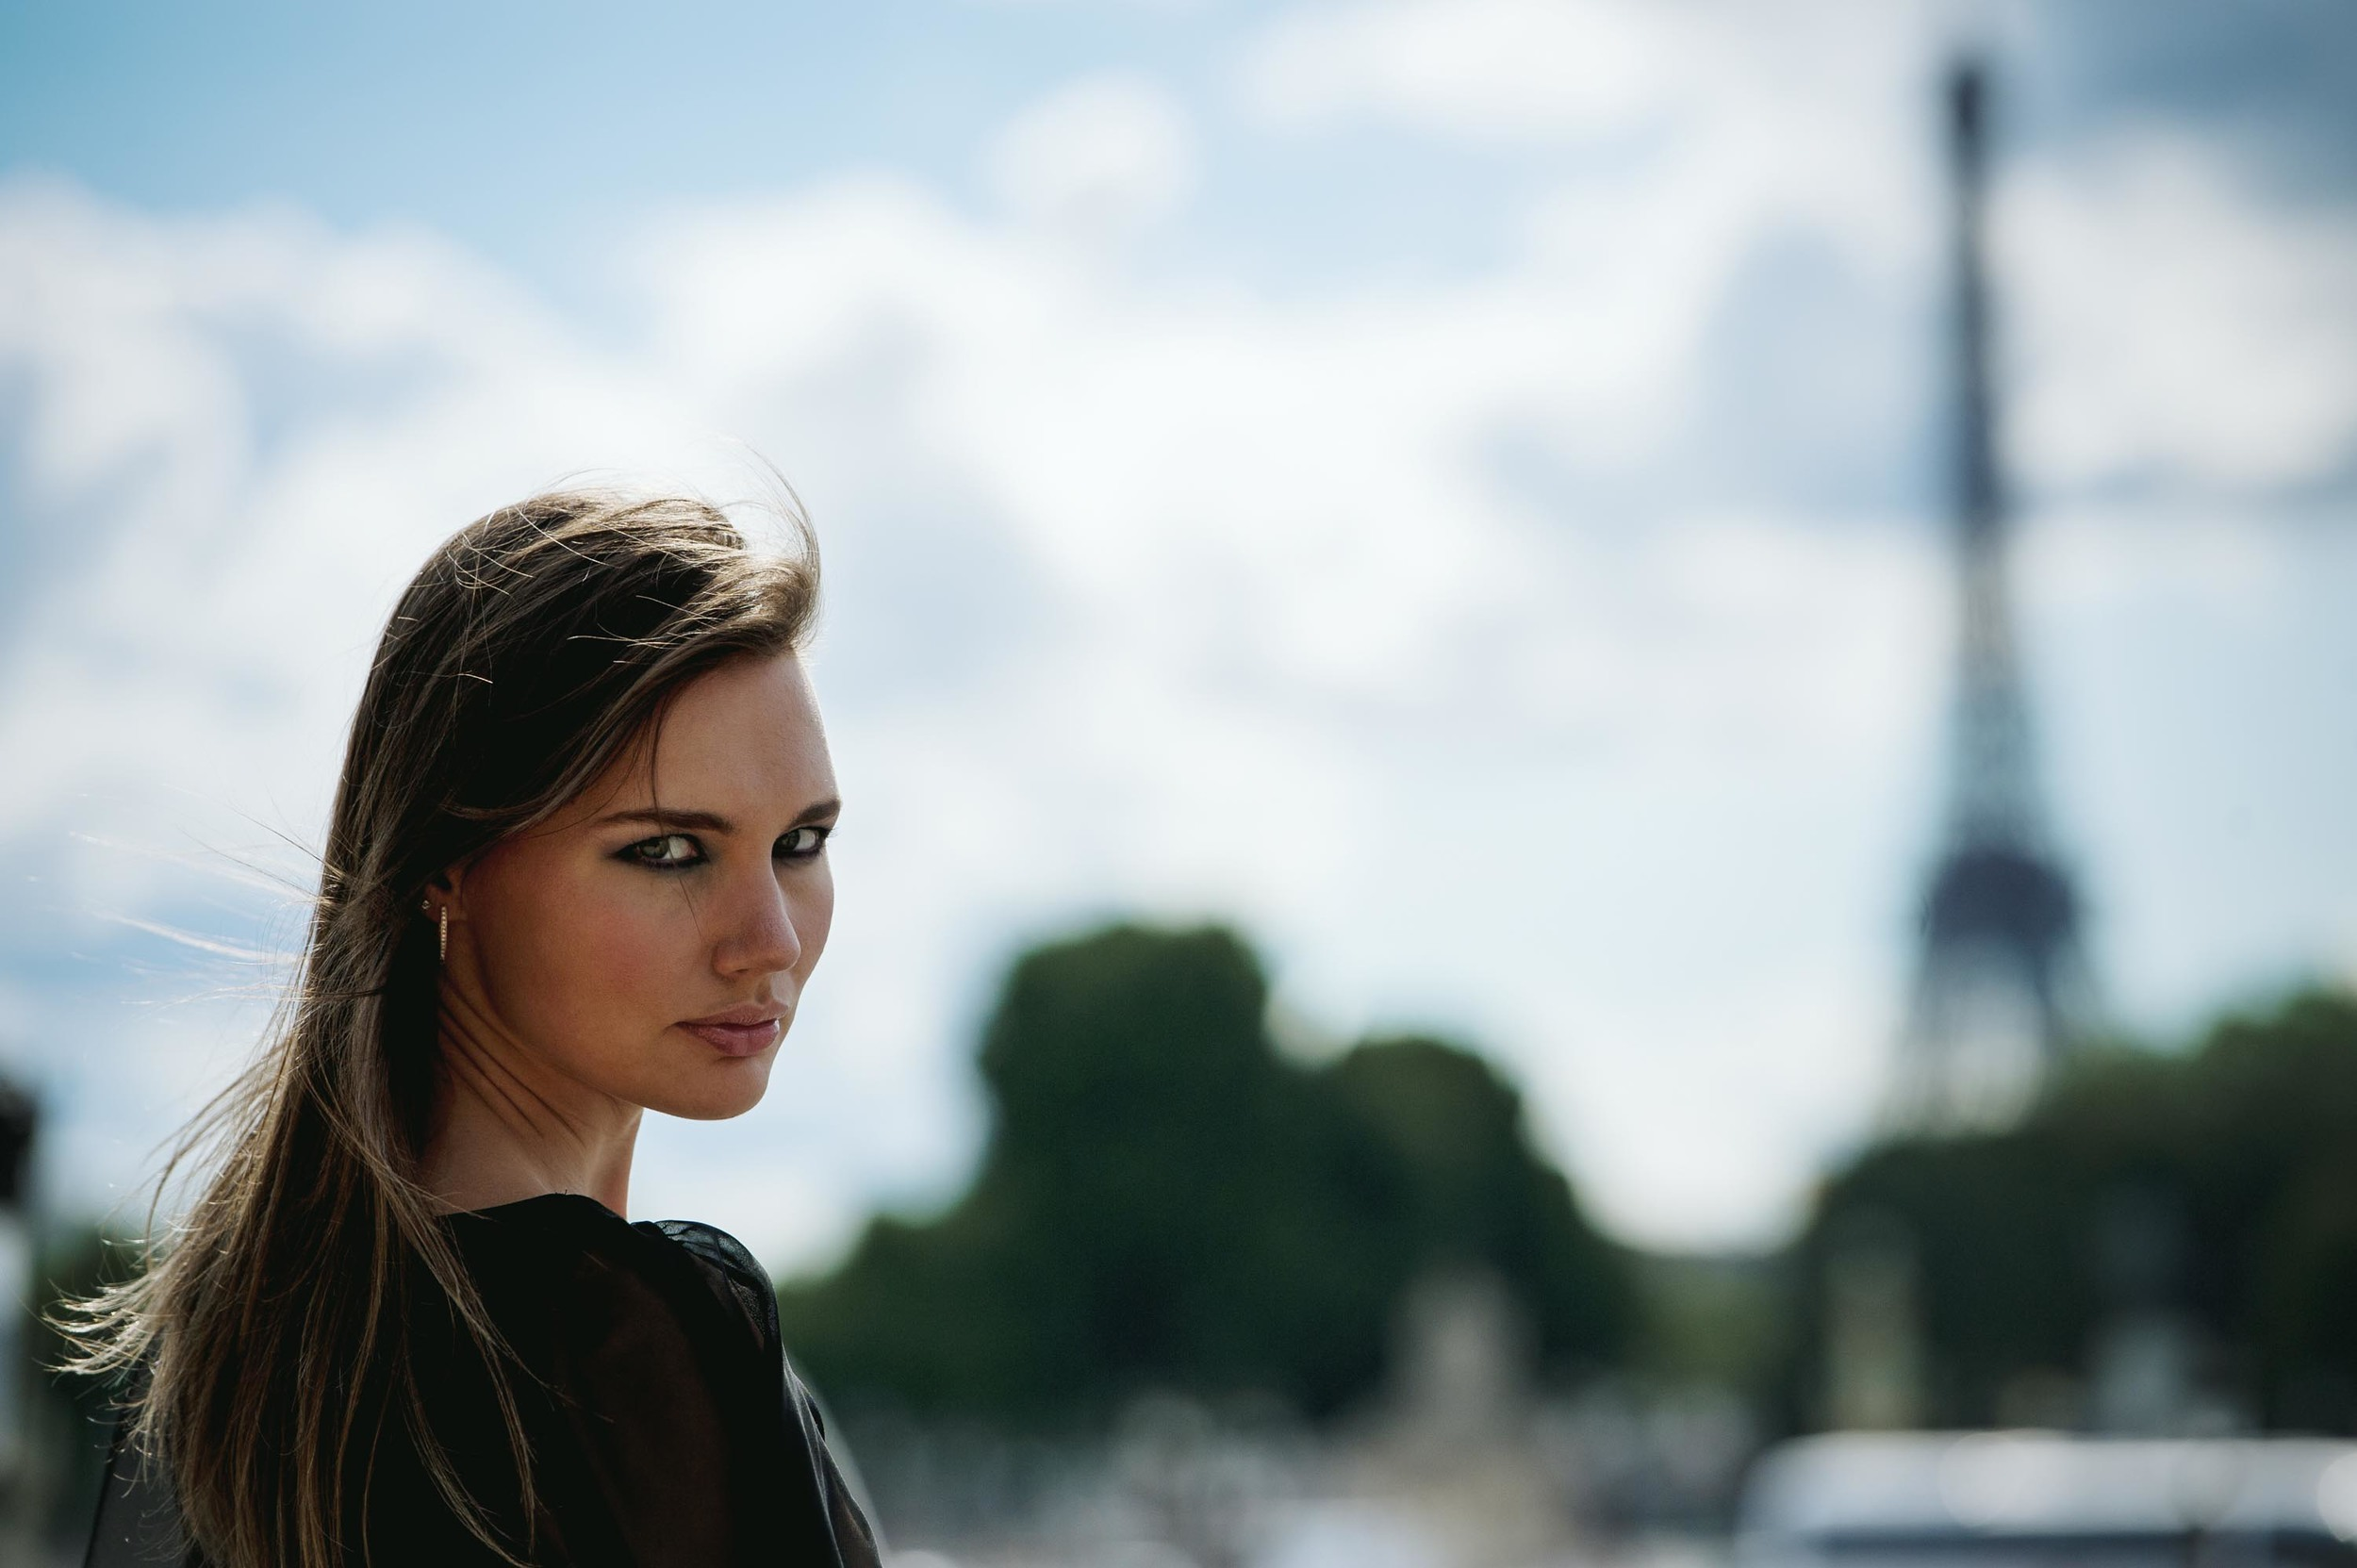 WNP_ParisPortraits_AnnaKras_130809_300-Edit.jpg